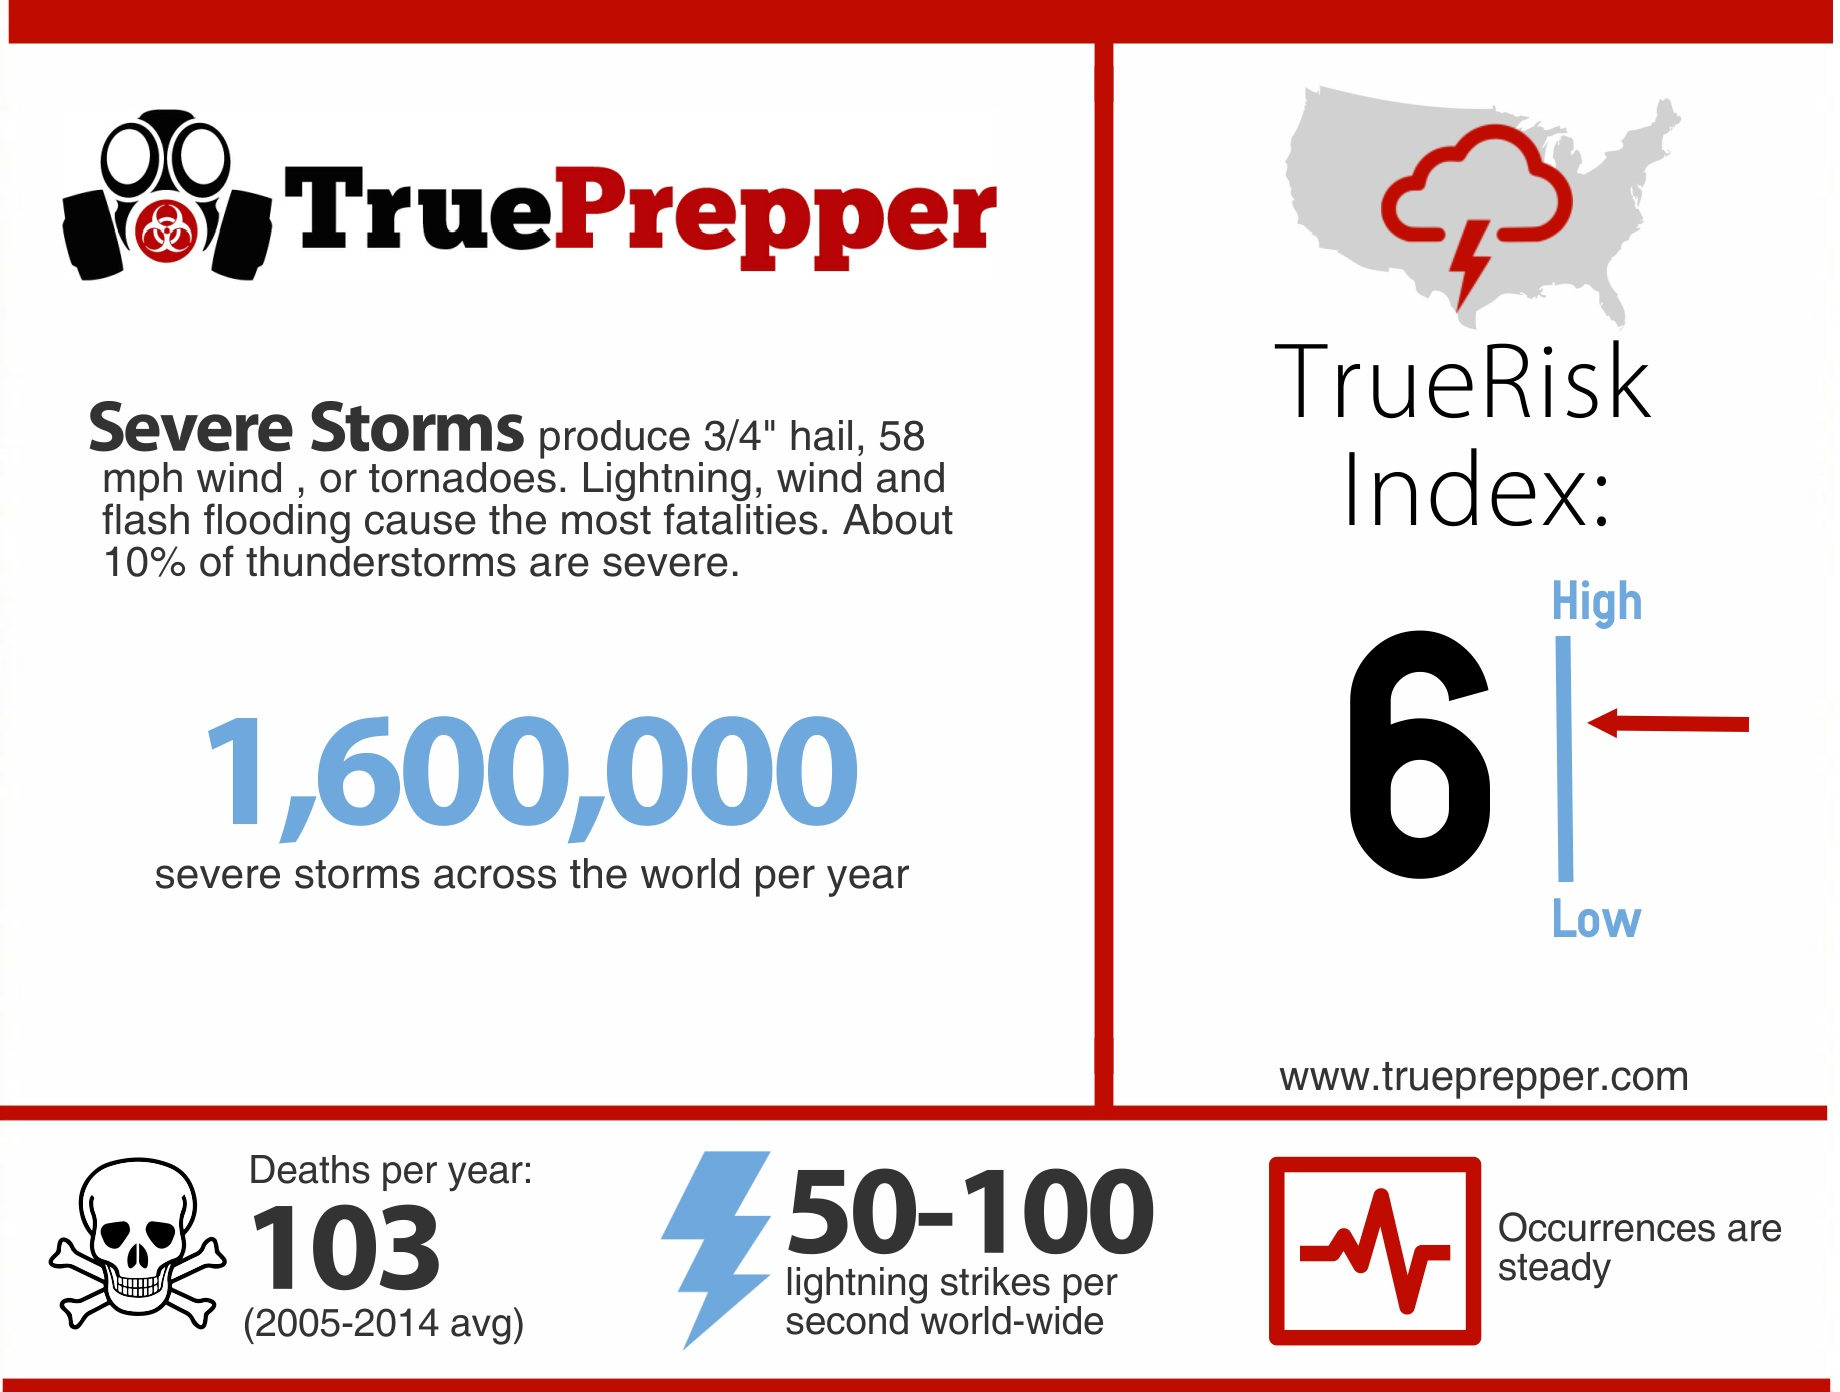 TrueRisk Severe Storms